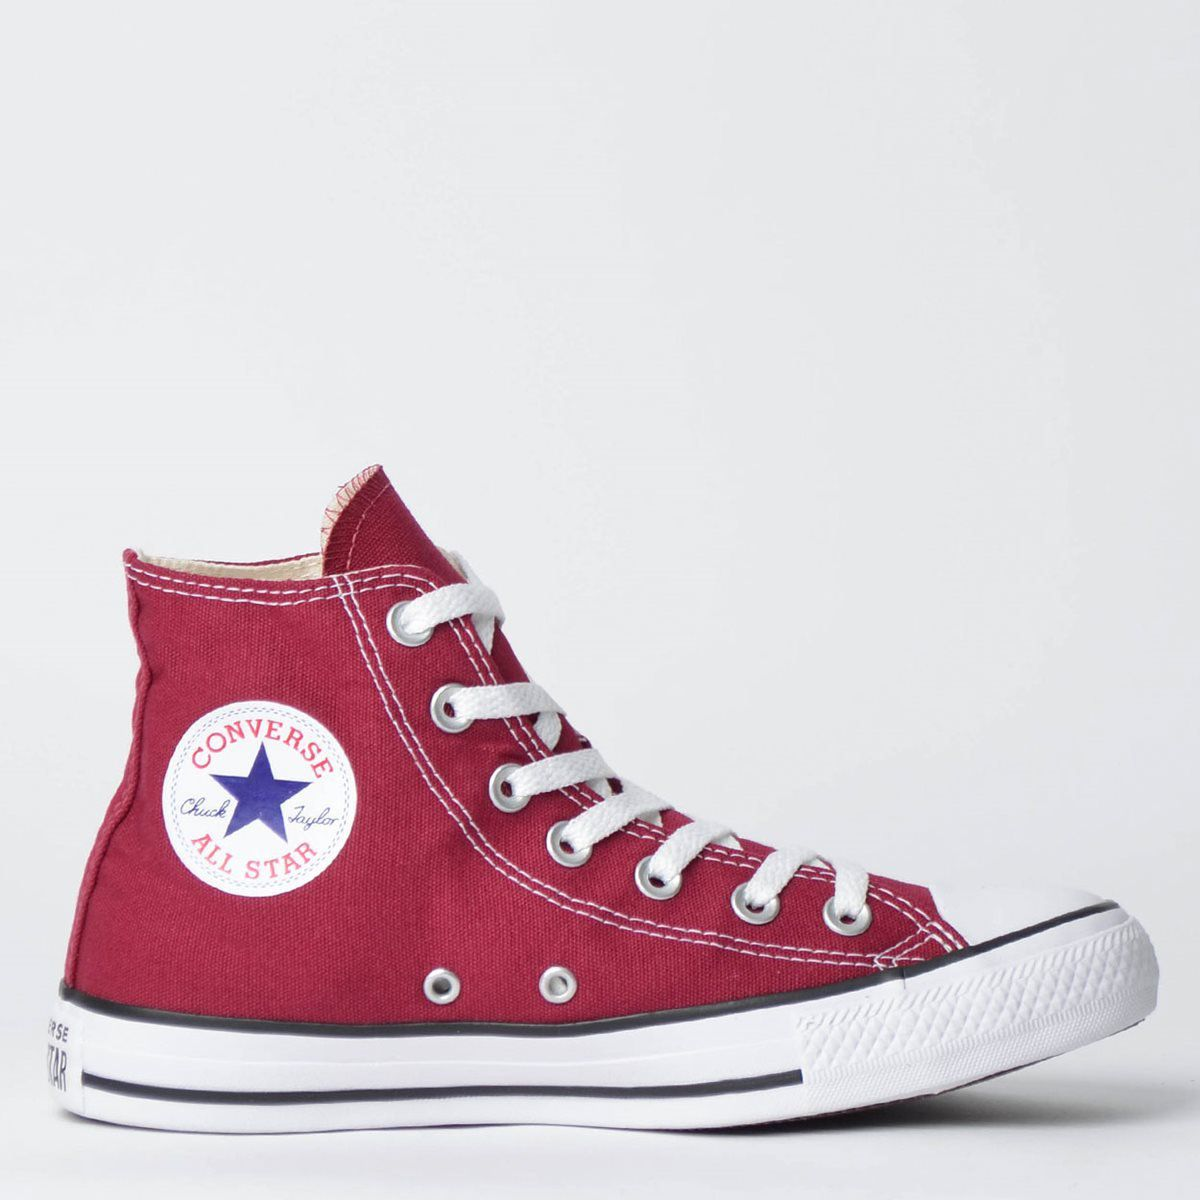 Tênis Converse Chuck Taylor All Star Bordô/Branco